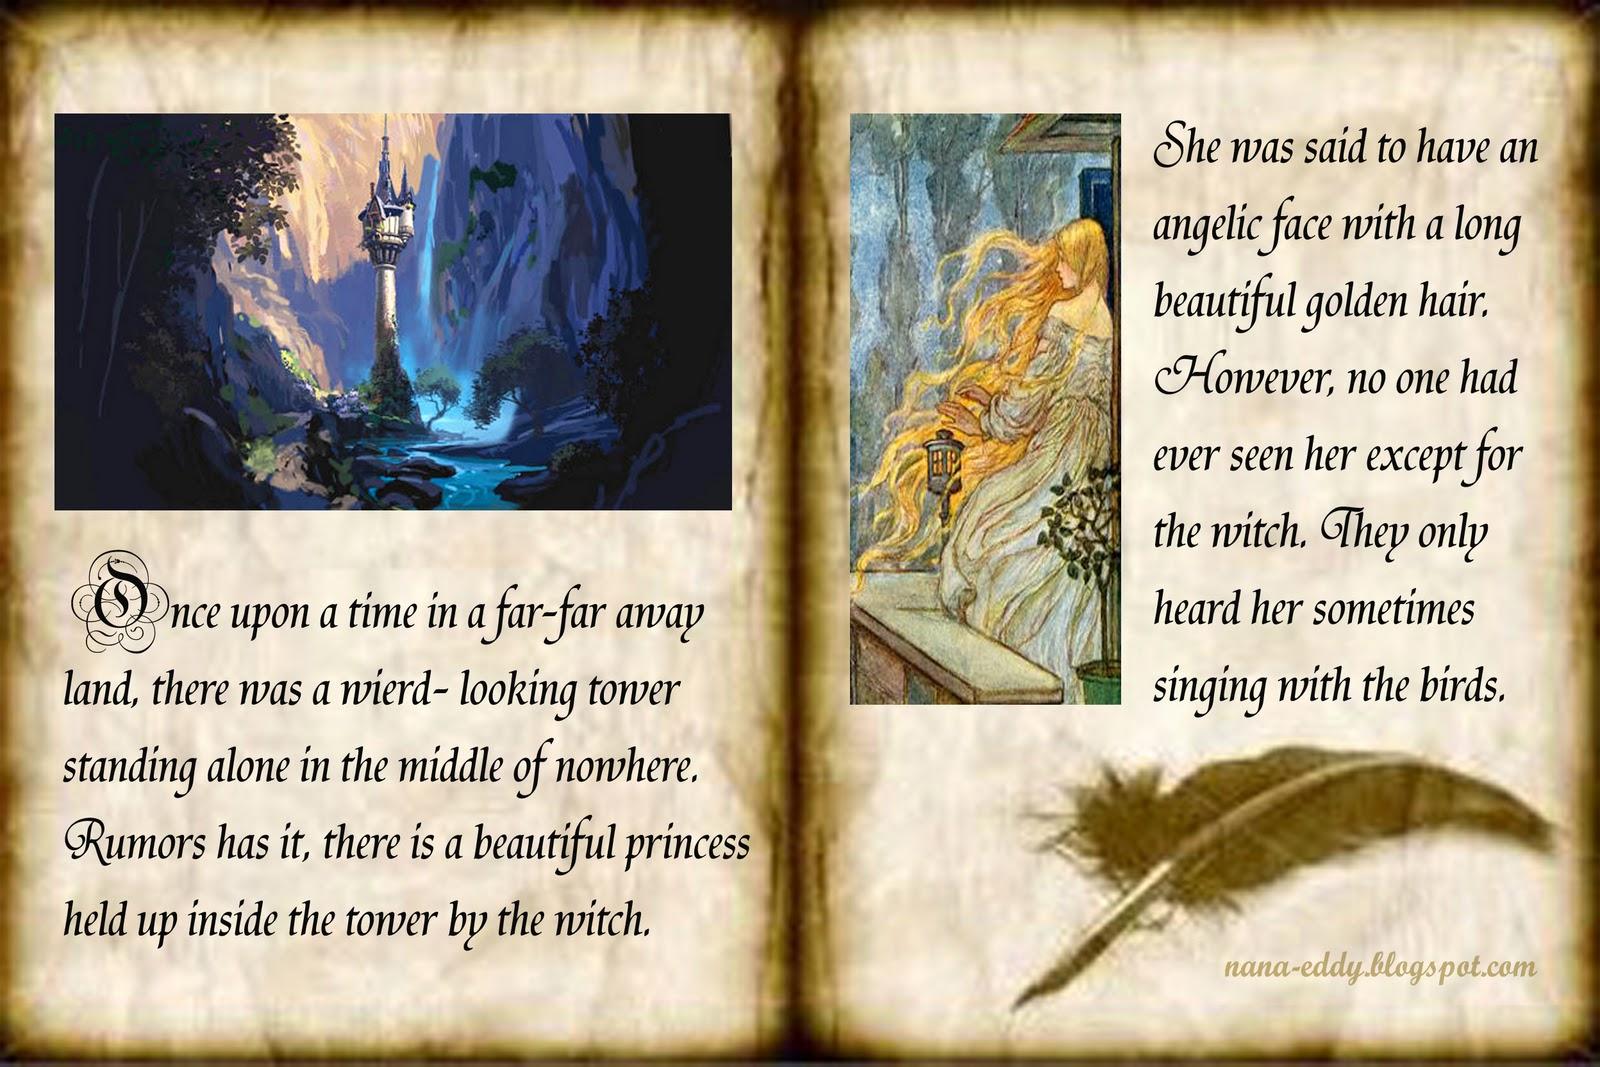 The fairytale of Rumpelstiltskin